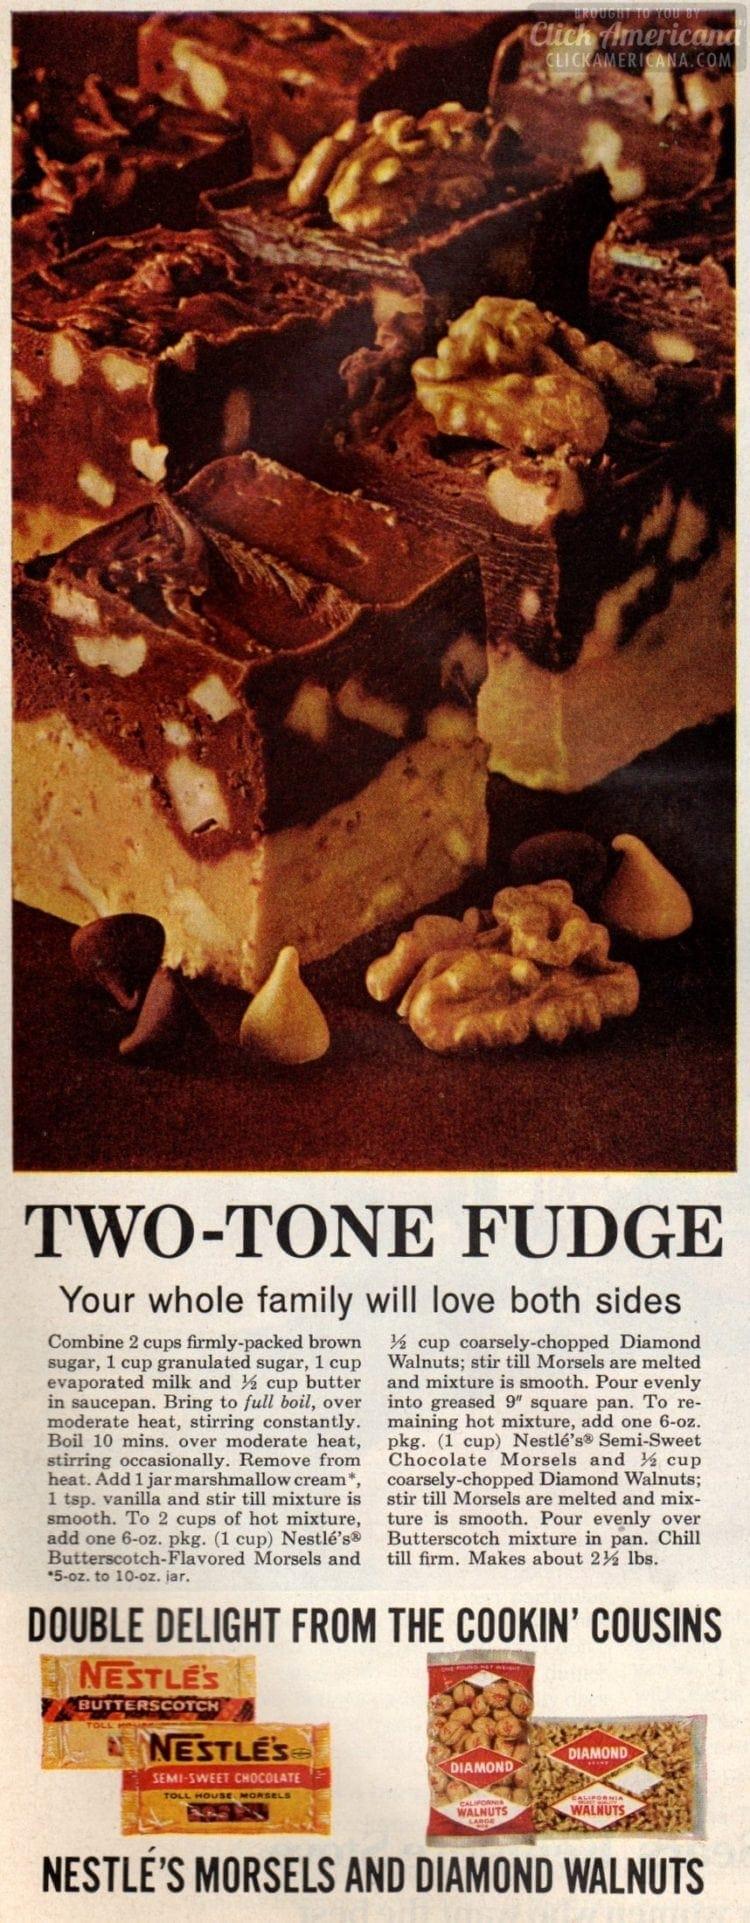 Two-tone fudge Chocolate butterscotch 1968 (2)